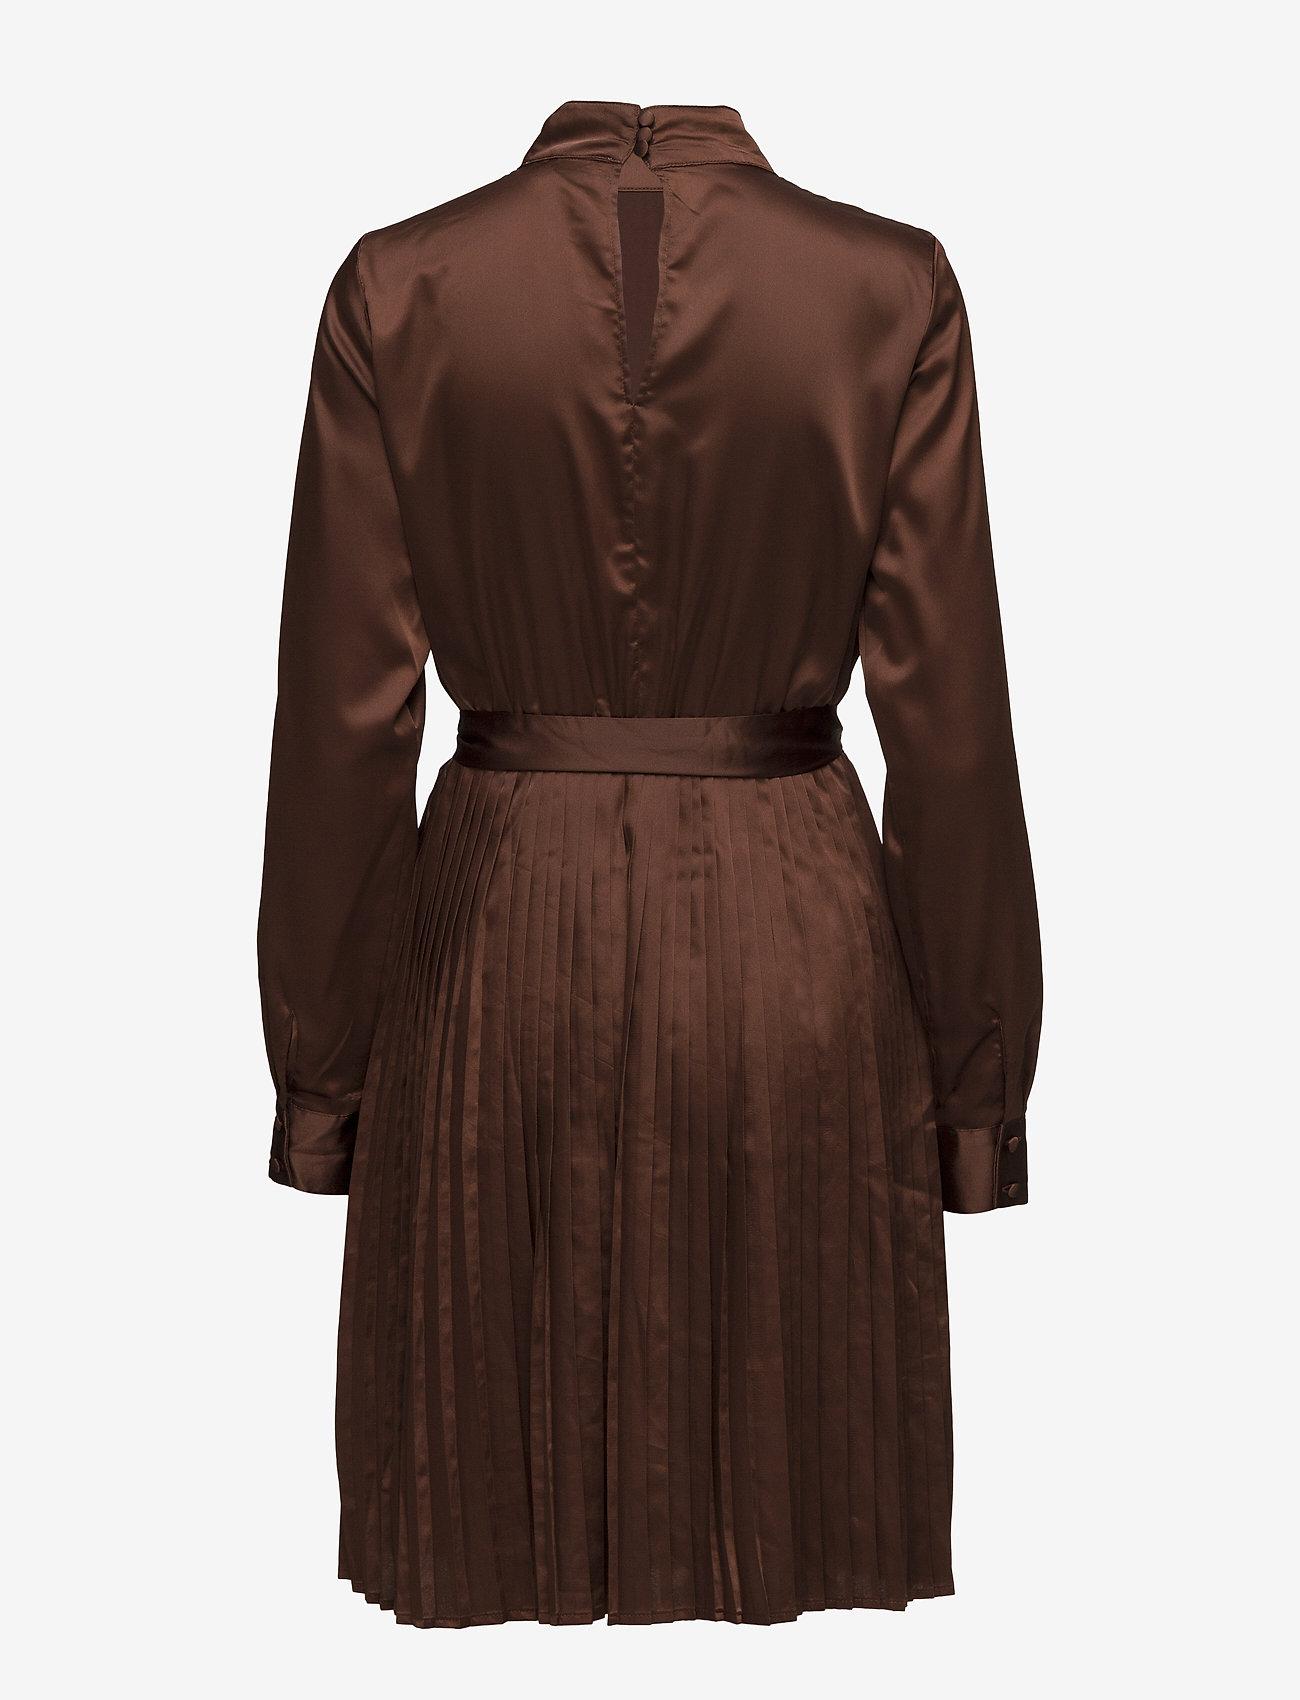 Gestuz Patrice Dress Ye16 - Dresses